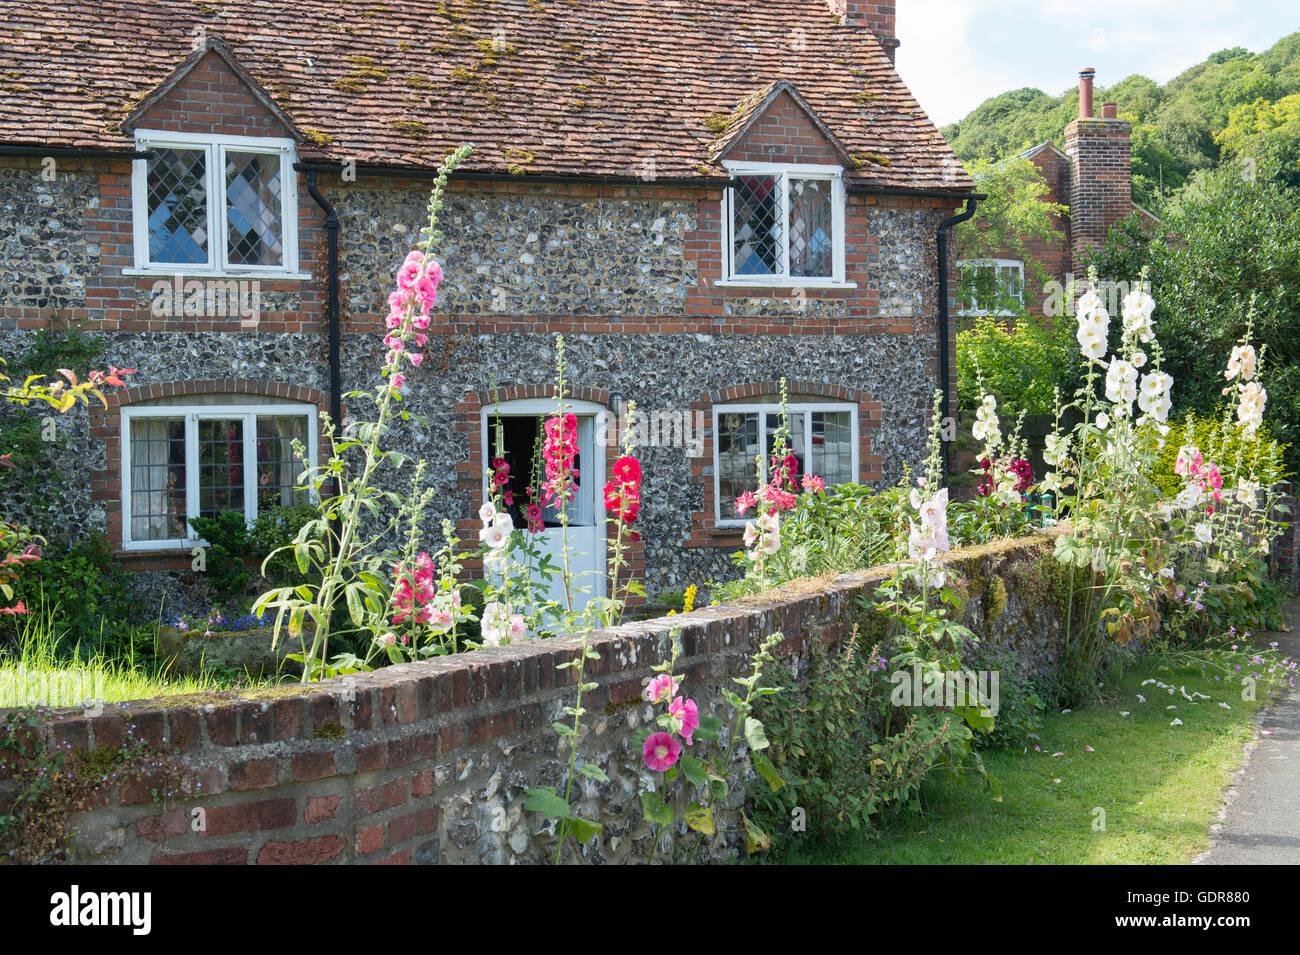 Cottage and hollyhocks, Hambleden, Buckinghamshire, England Stock Photo